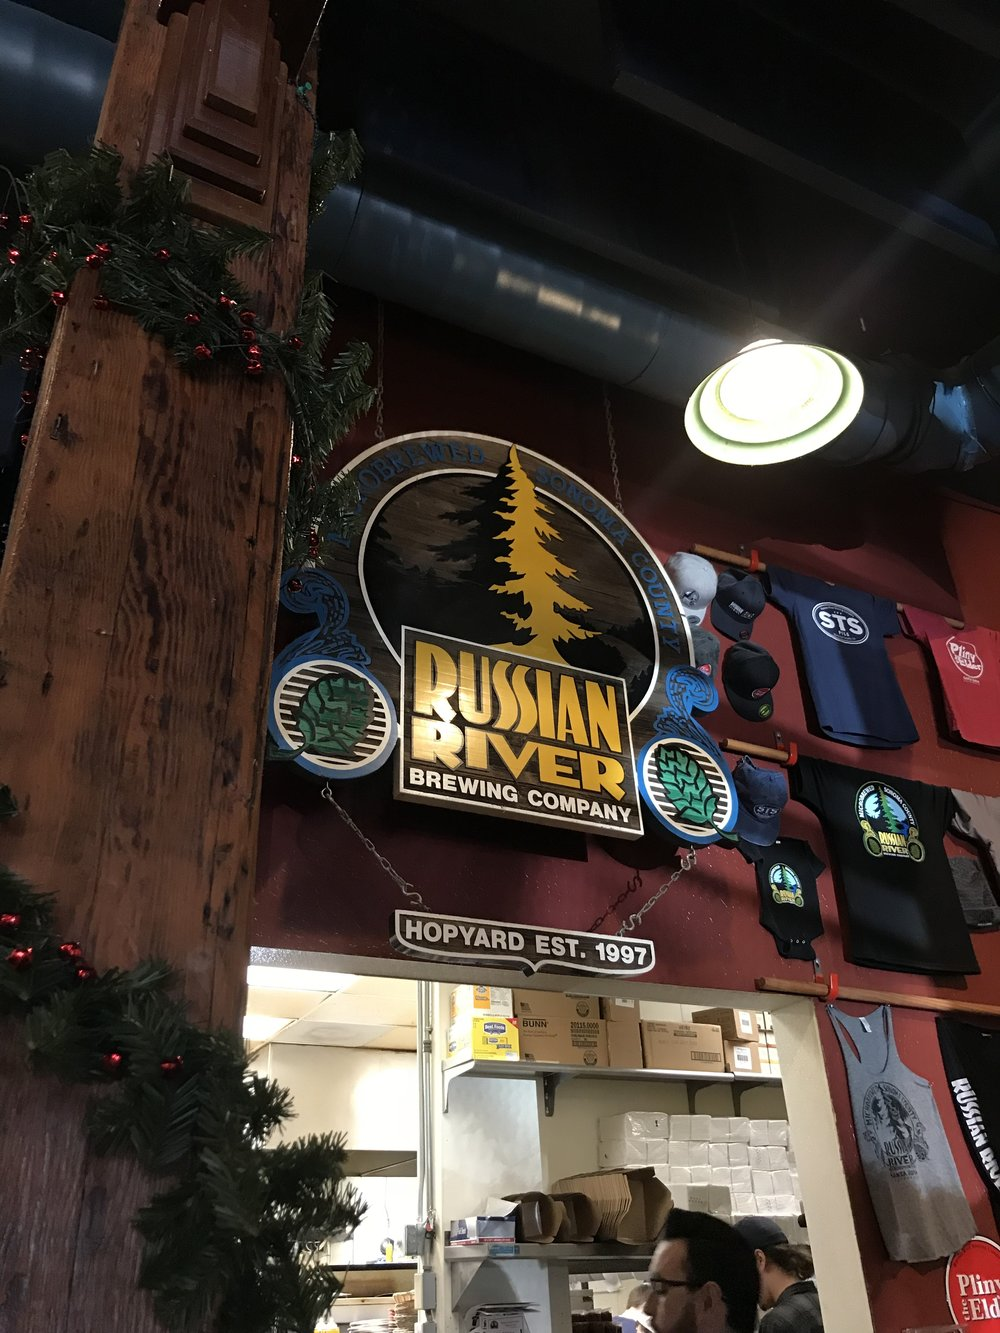 Russian River Brewery Brew pub